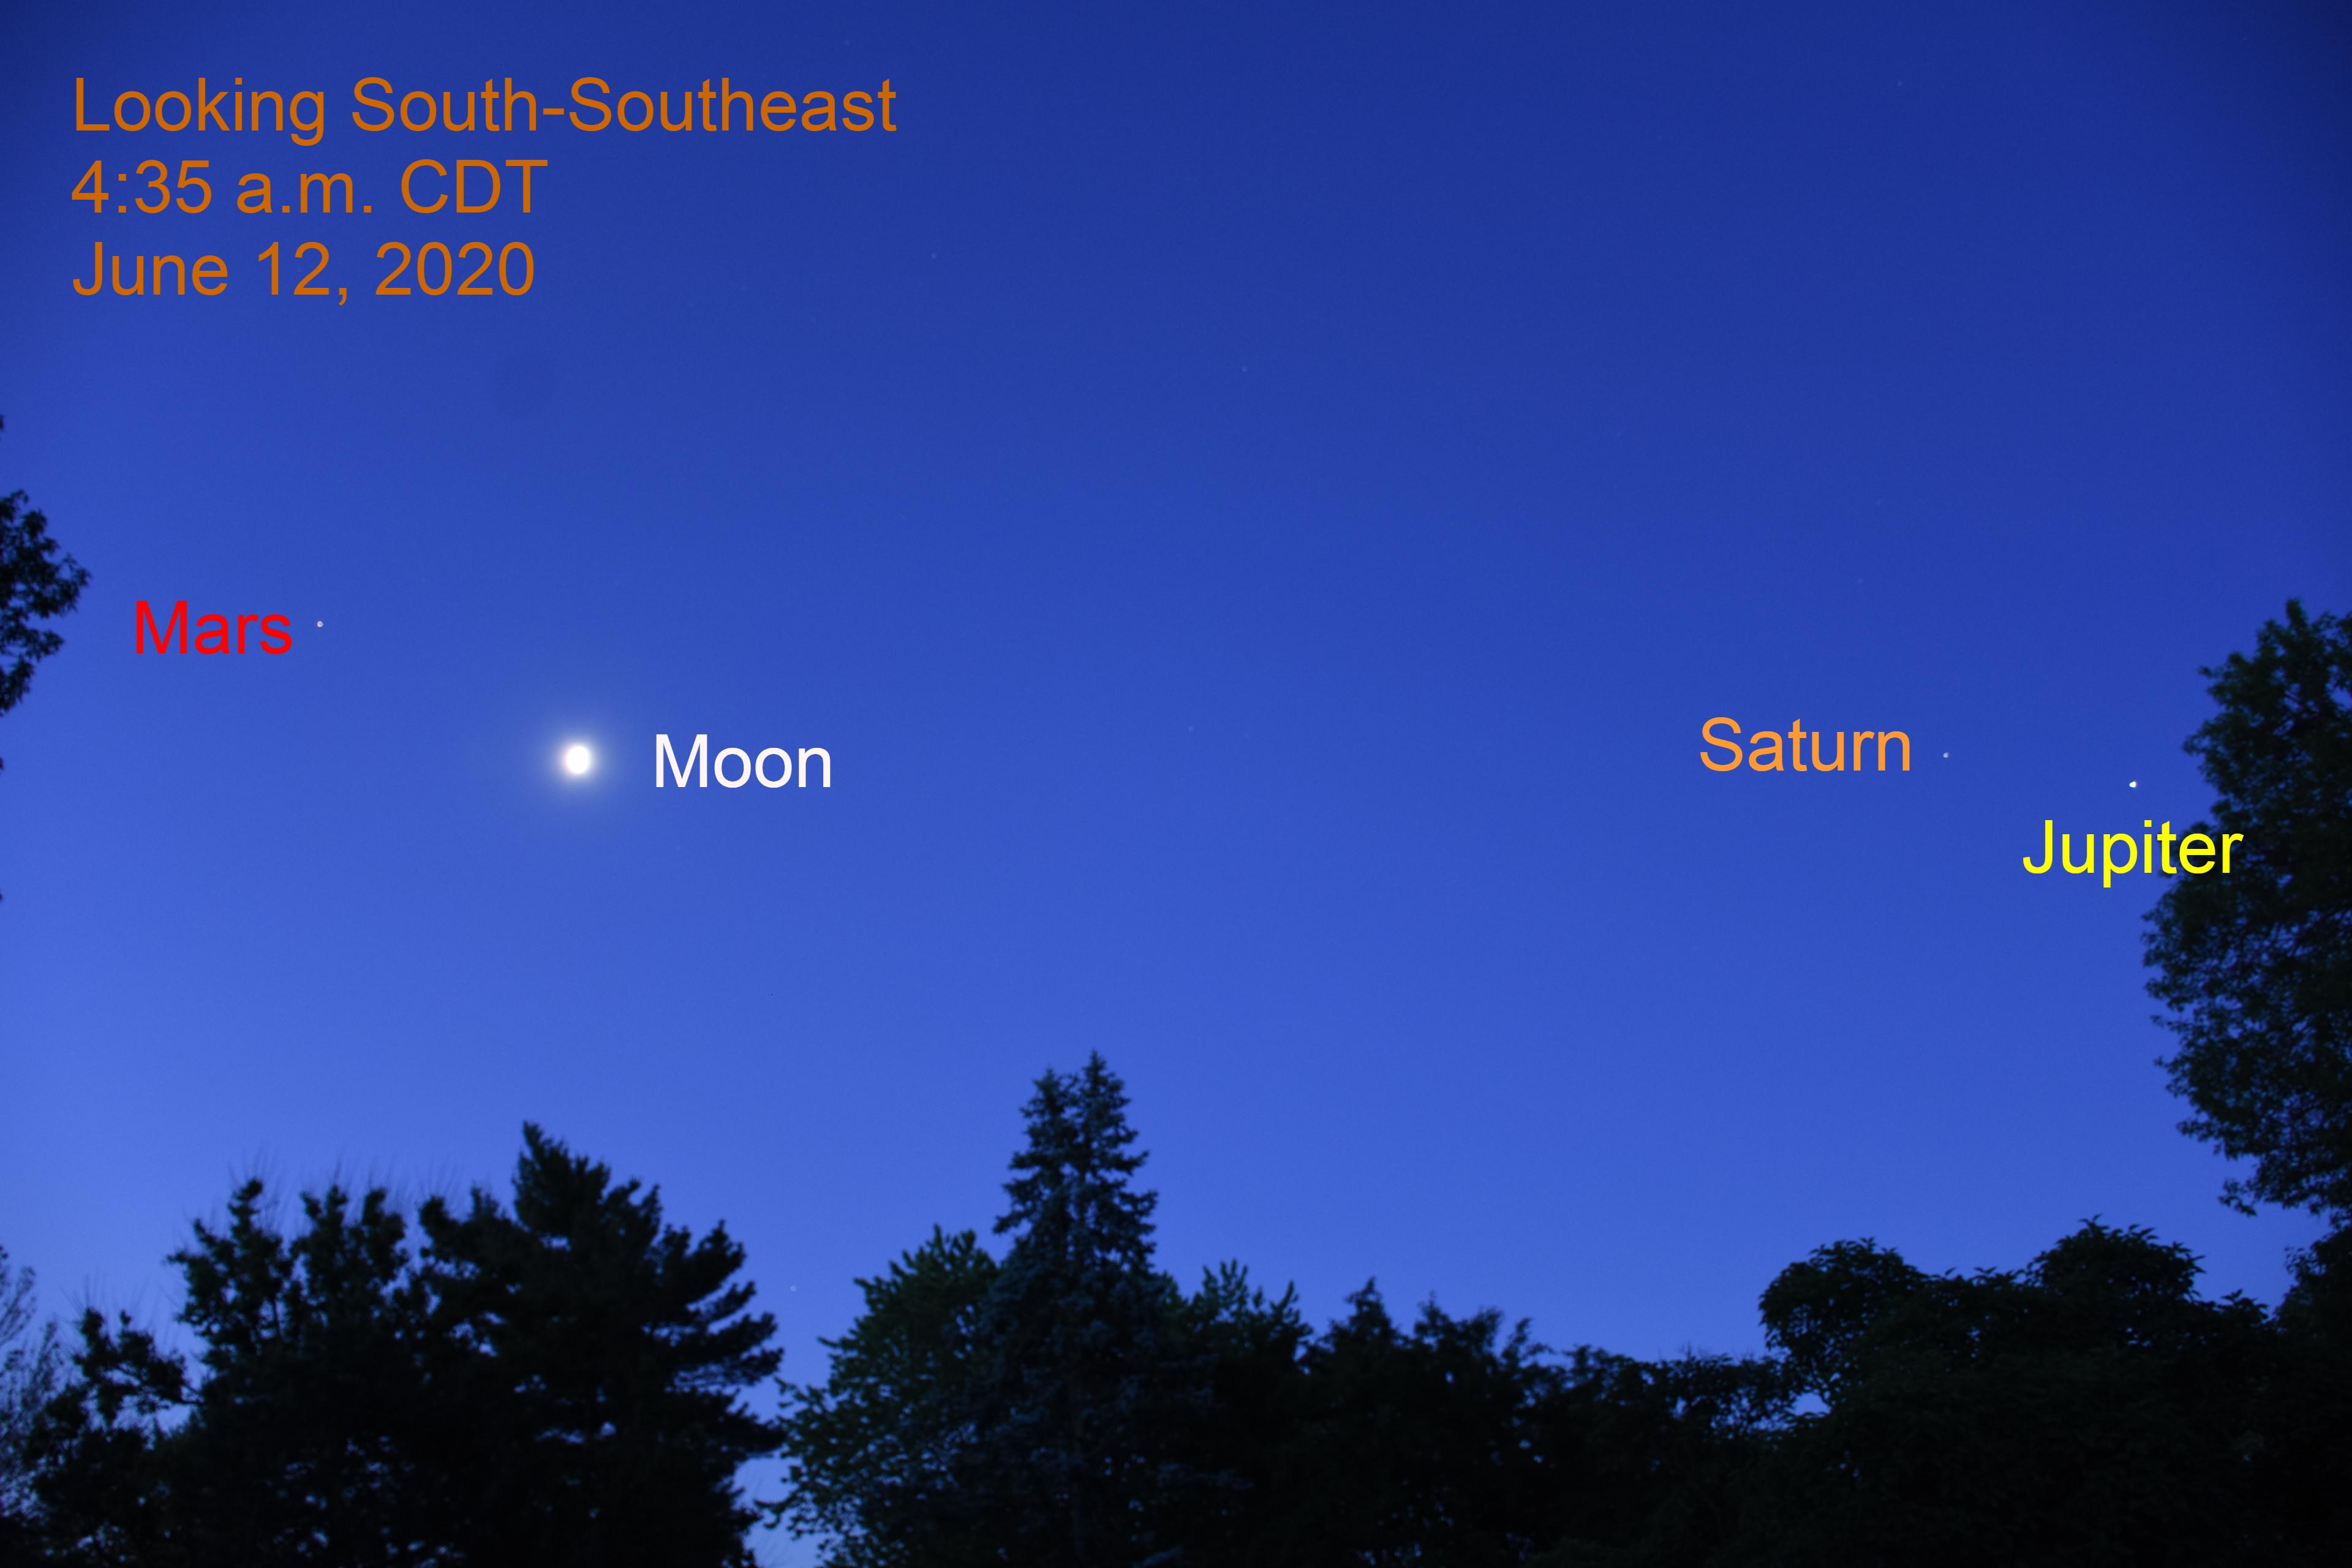 Mars, Moon, Saturn, and Jupiter, June 12, 2020